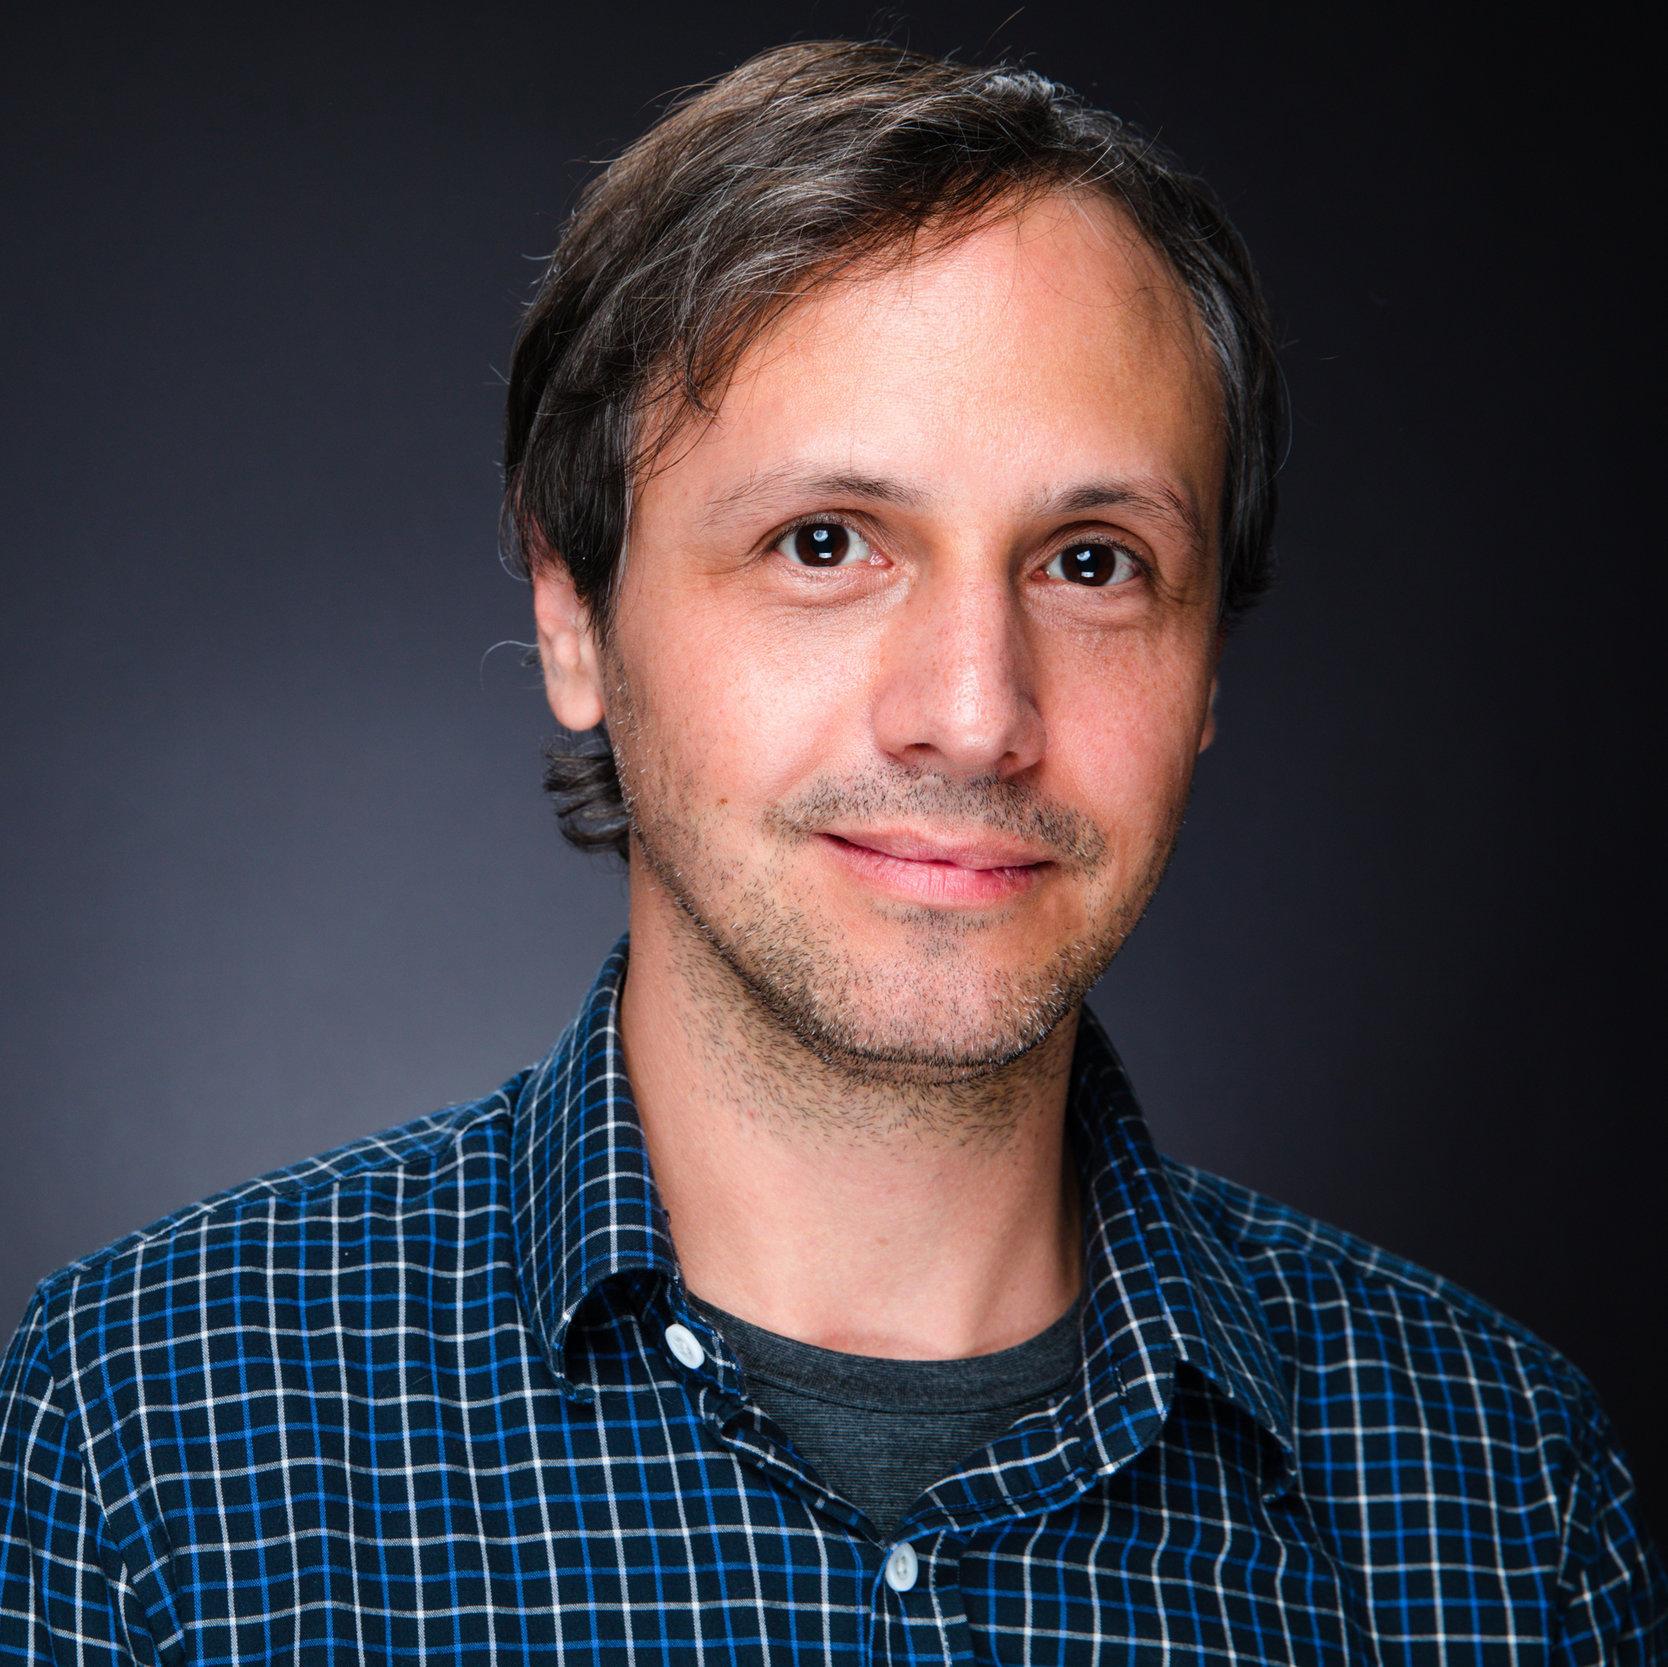 Sebastian Perez-Burchard